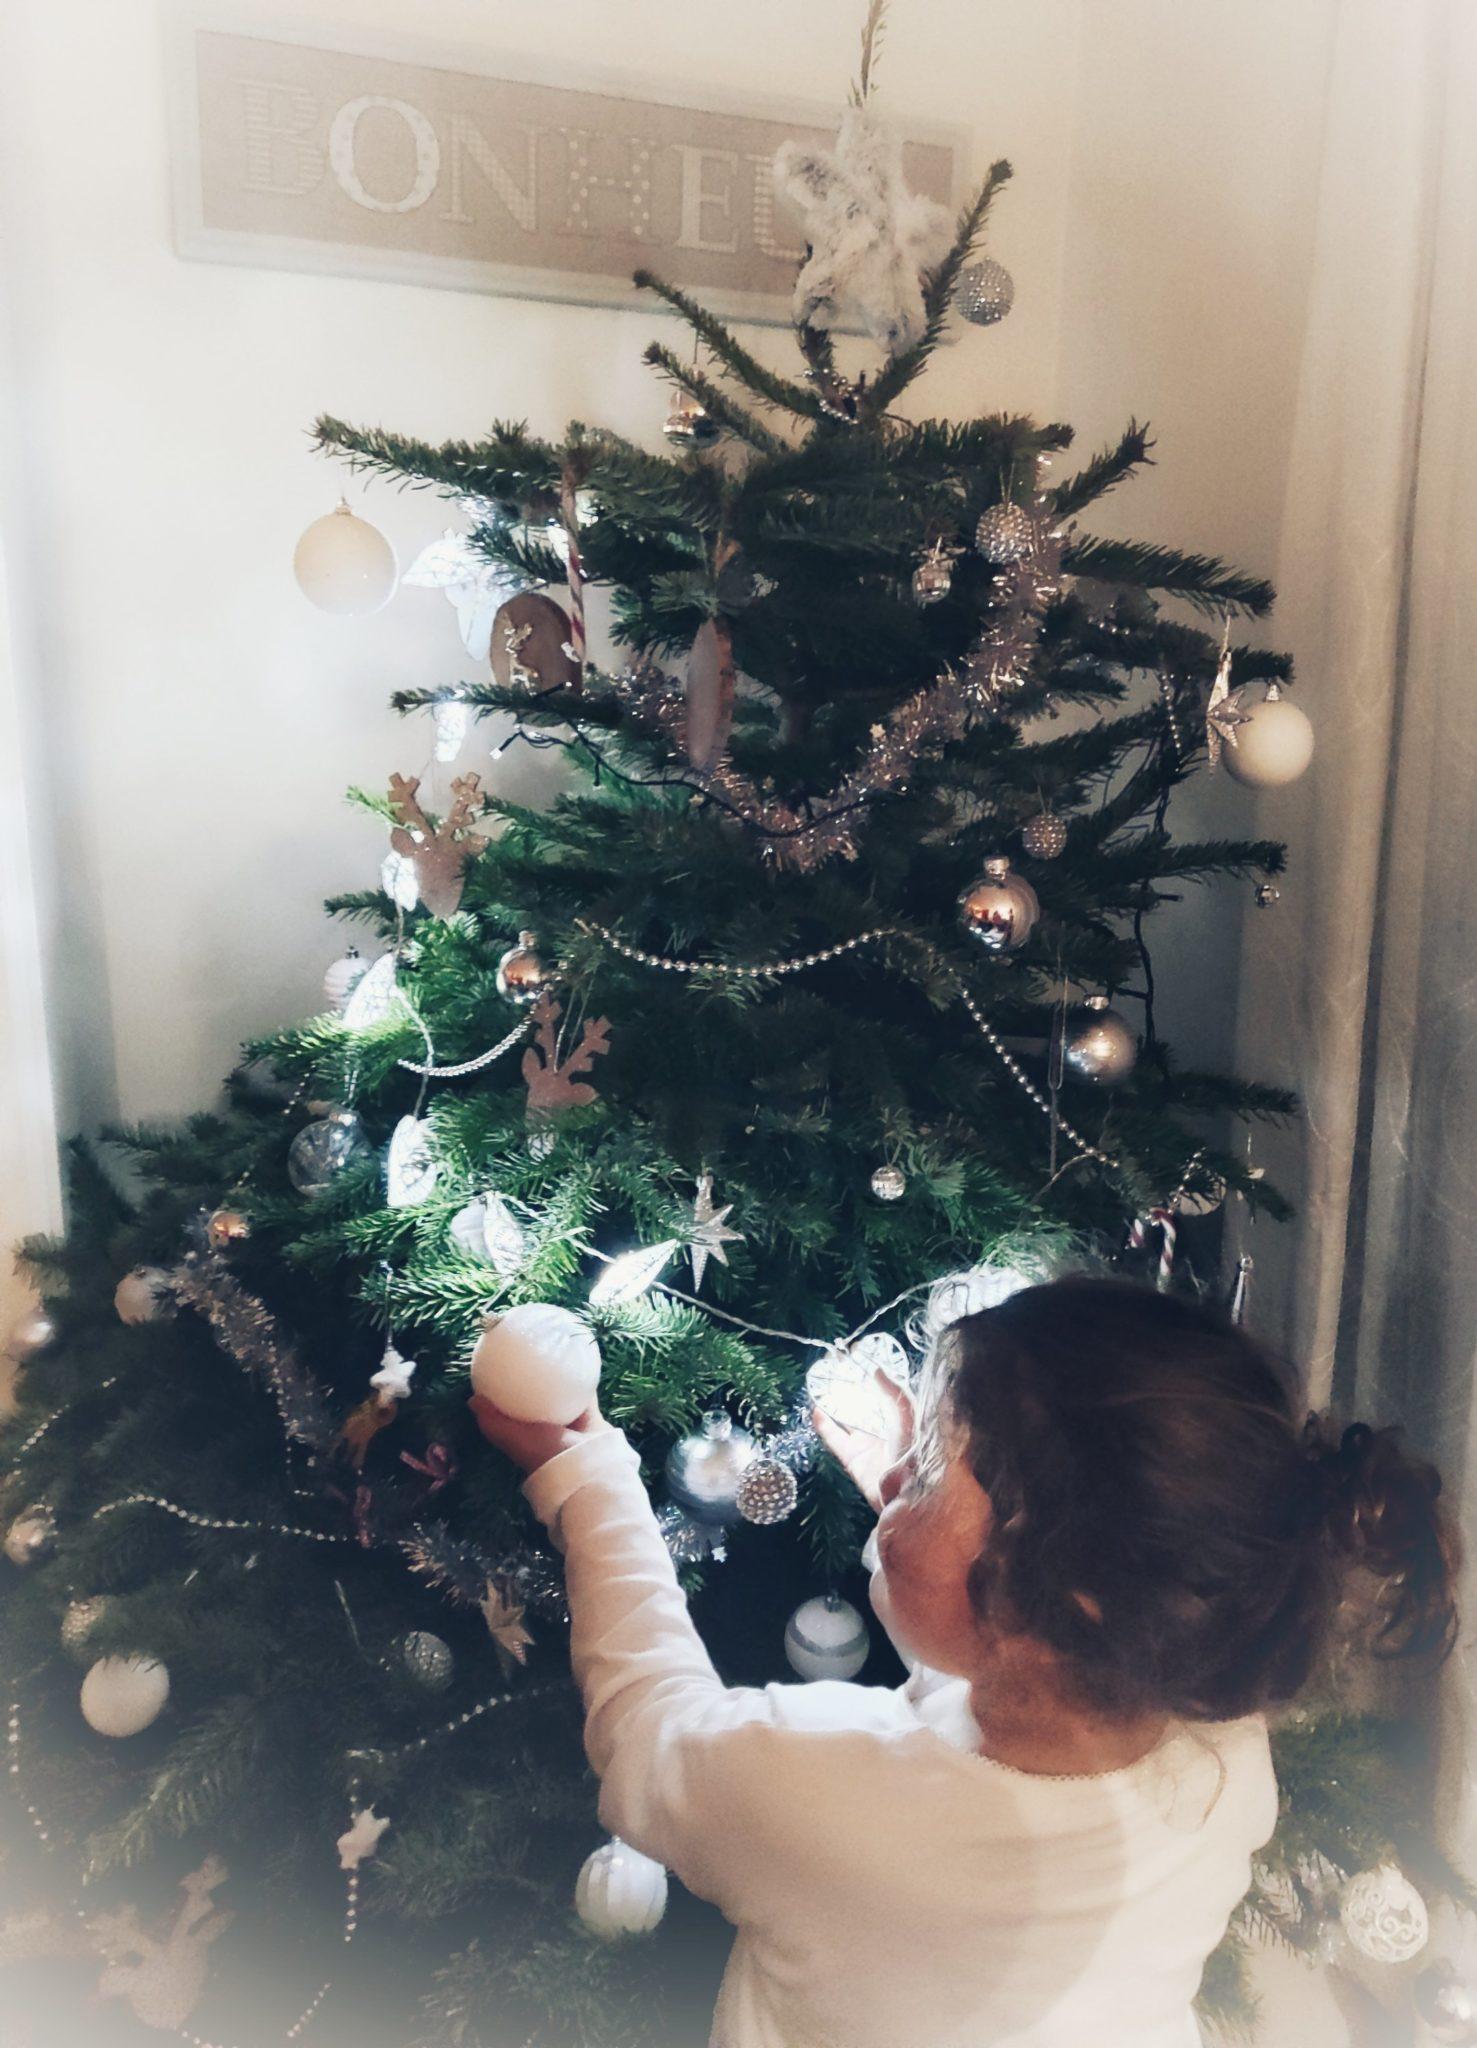 Blog MummyBenti wishlist P¨récieuse 5 ans Noël